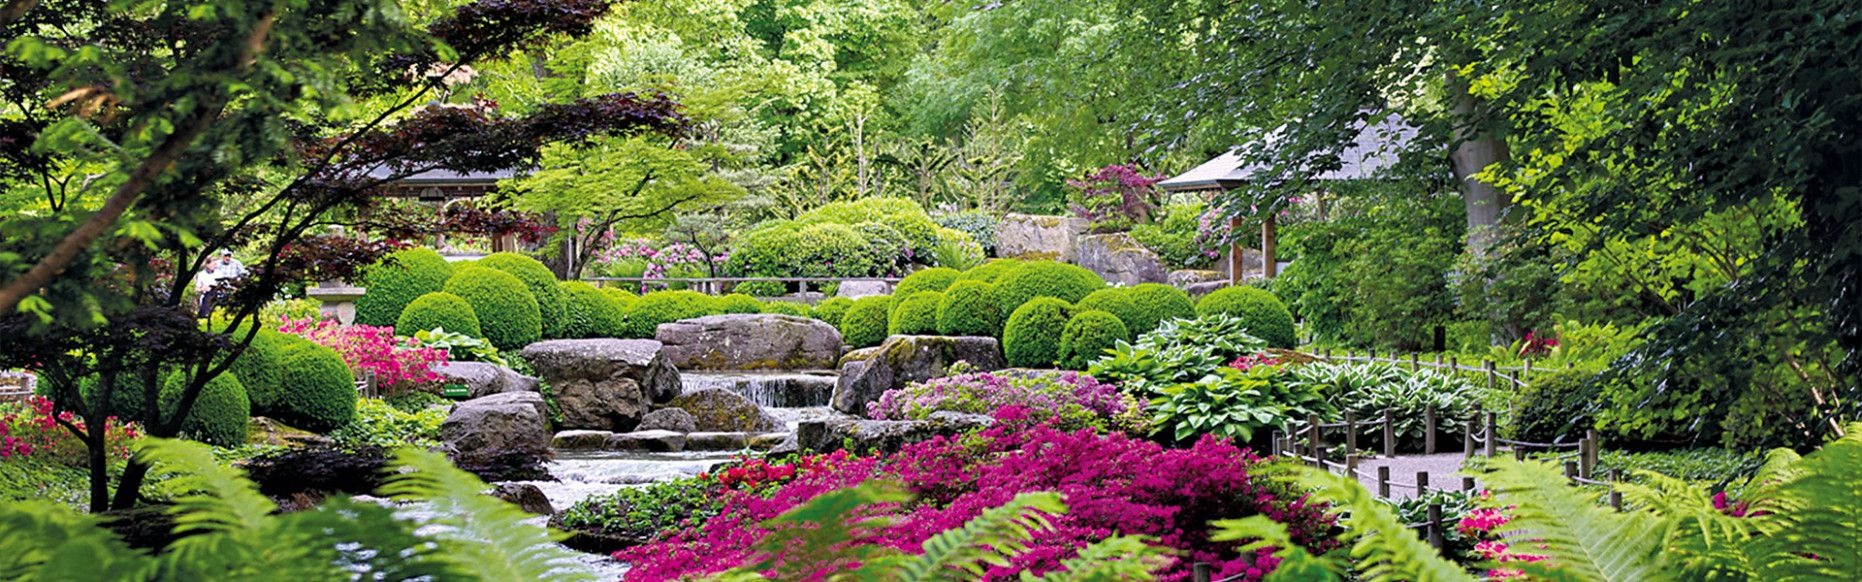 Augsburg Garten In 2021 Garten Botanischer Garten Augsburg Japanischer Garten